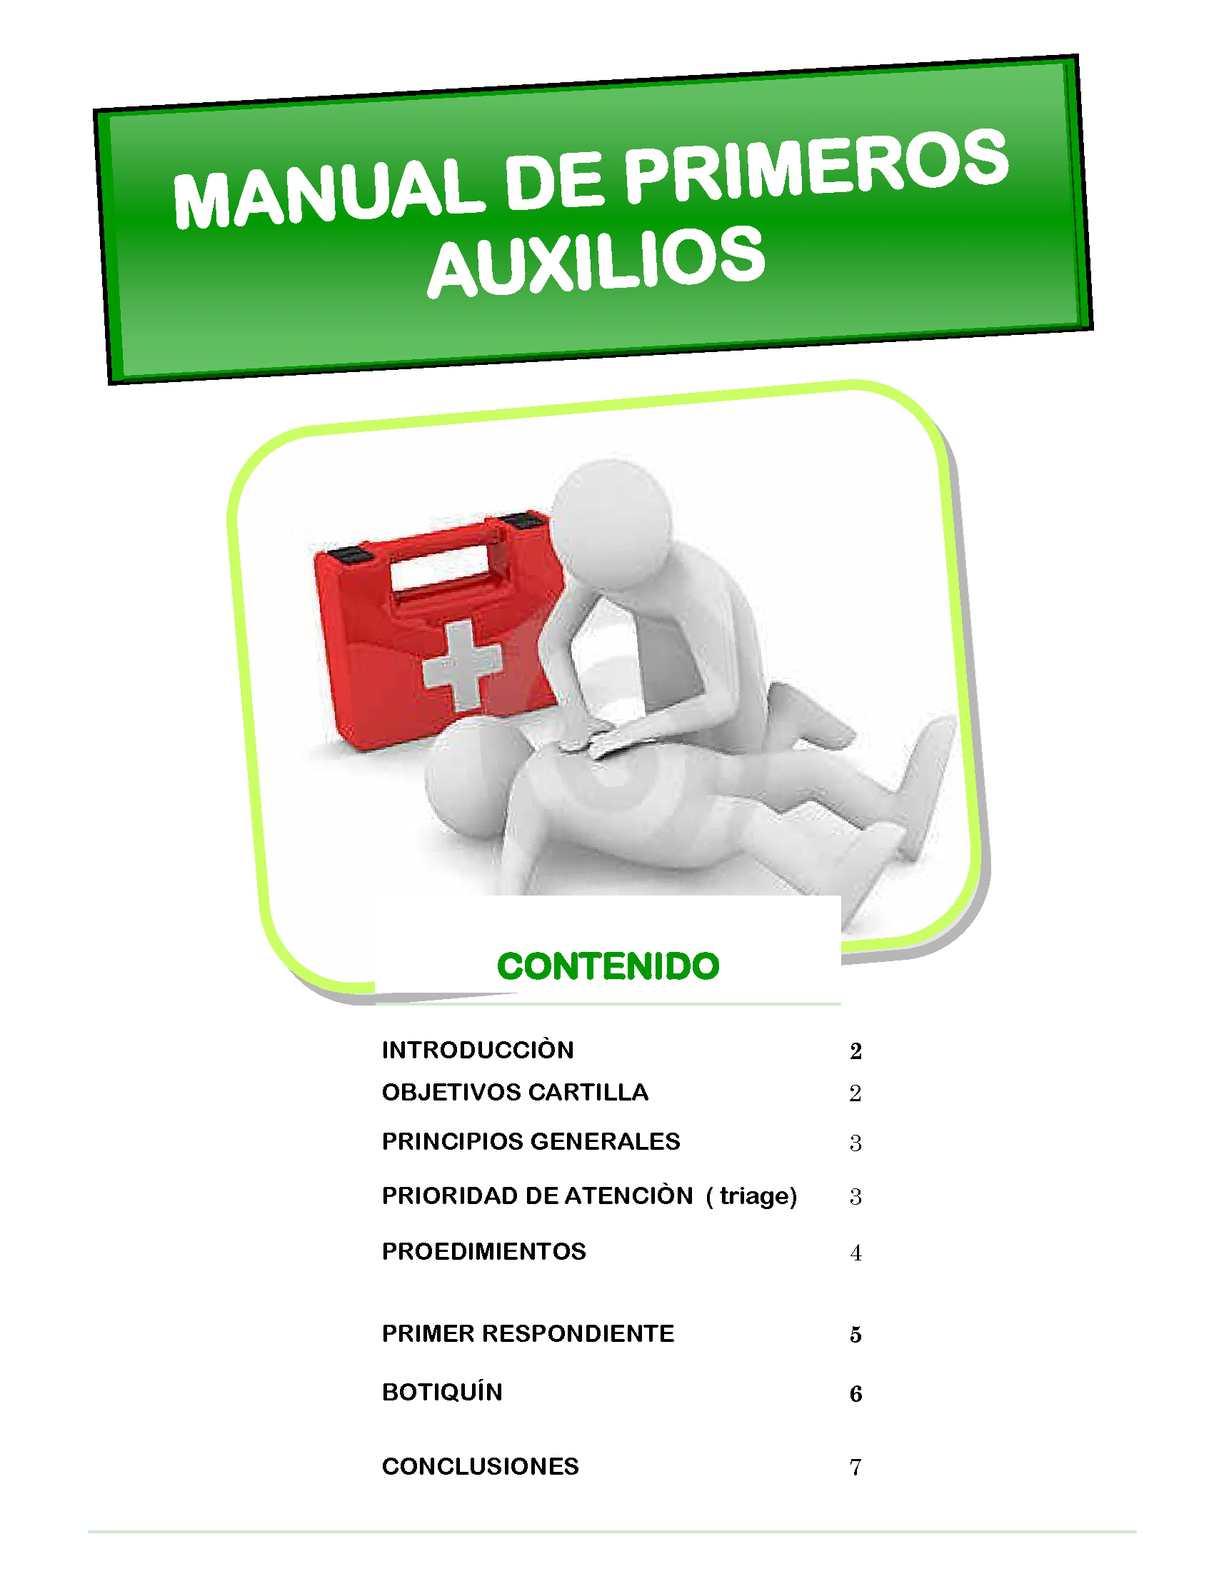 6bd19fea1d9 Calaméo - Manual de primeros auxilios